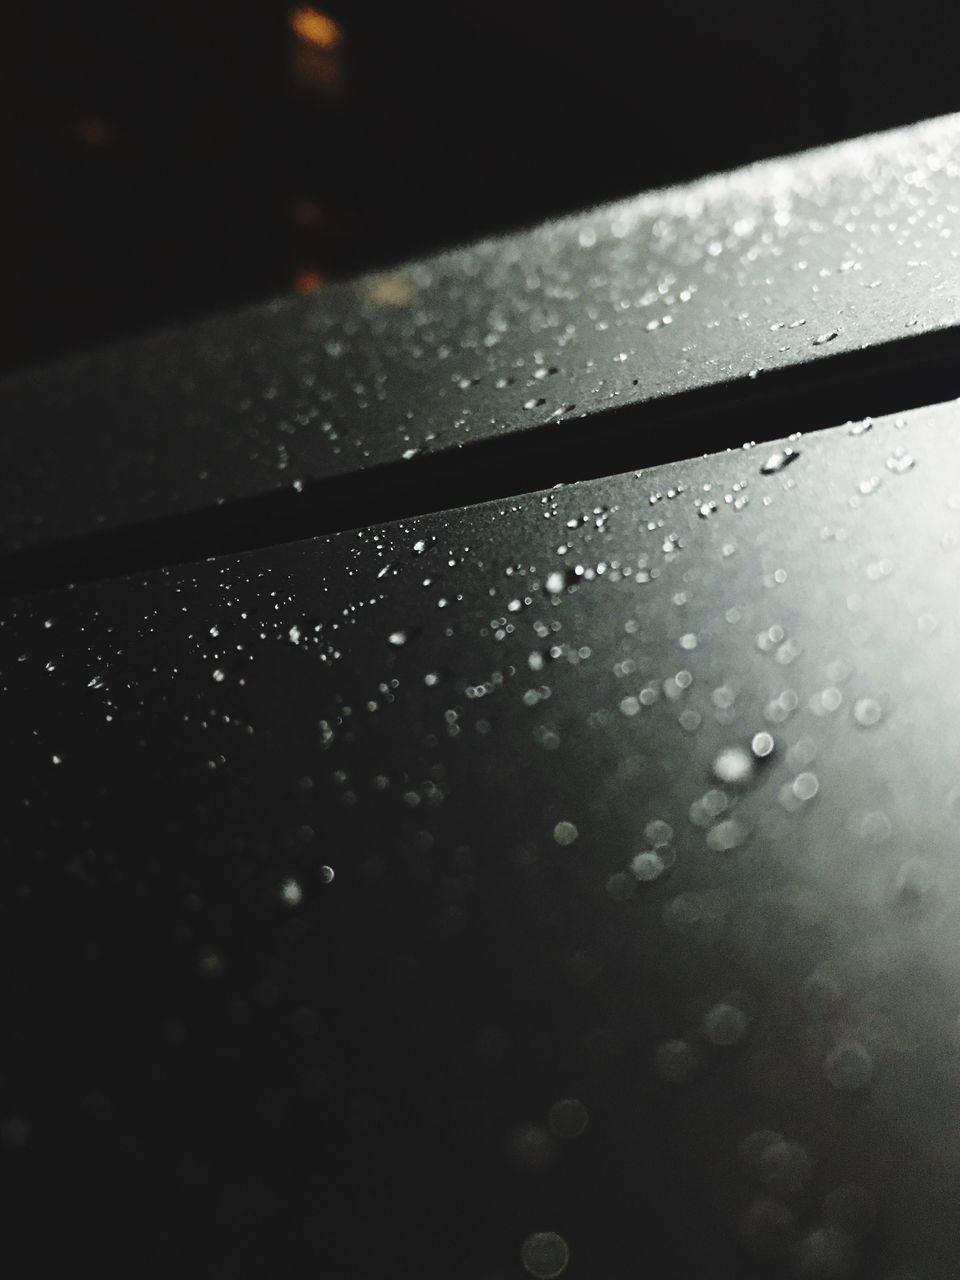 water, drop, indoors, window, wet, no people, close-up, raindrop, day, illuminated, nature, freshness